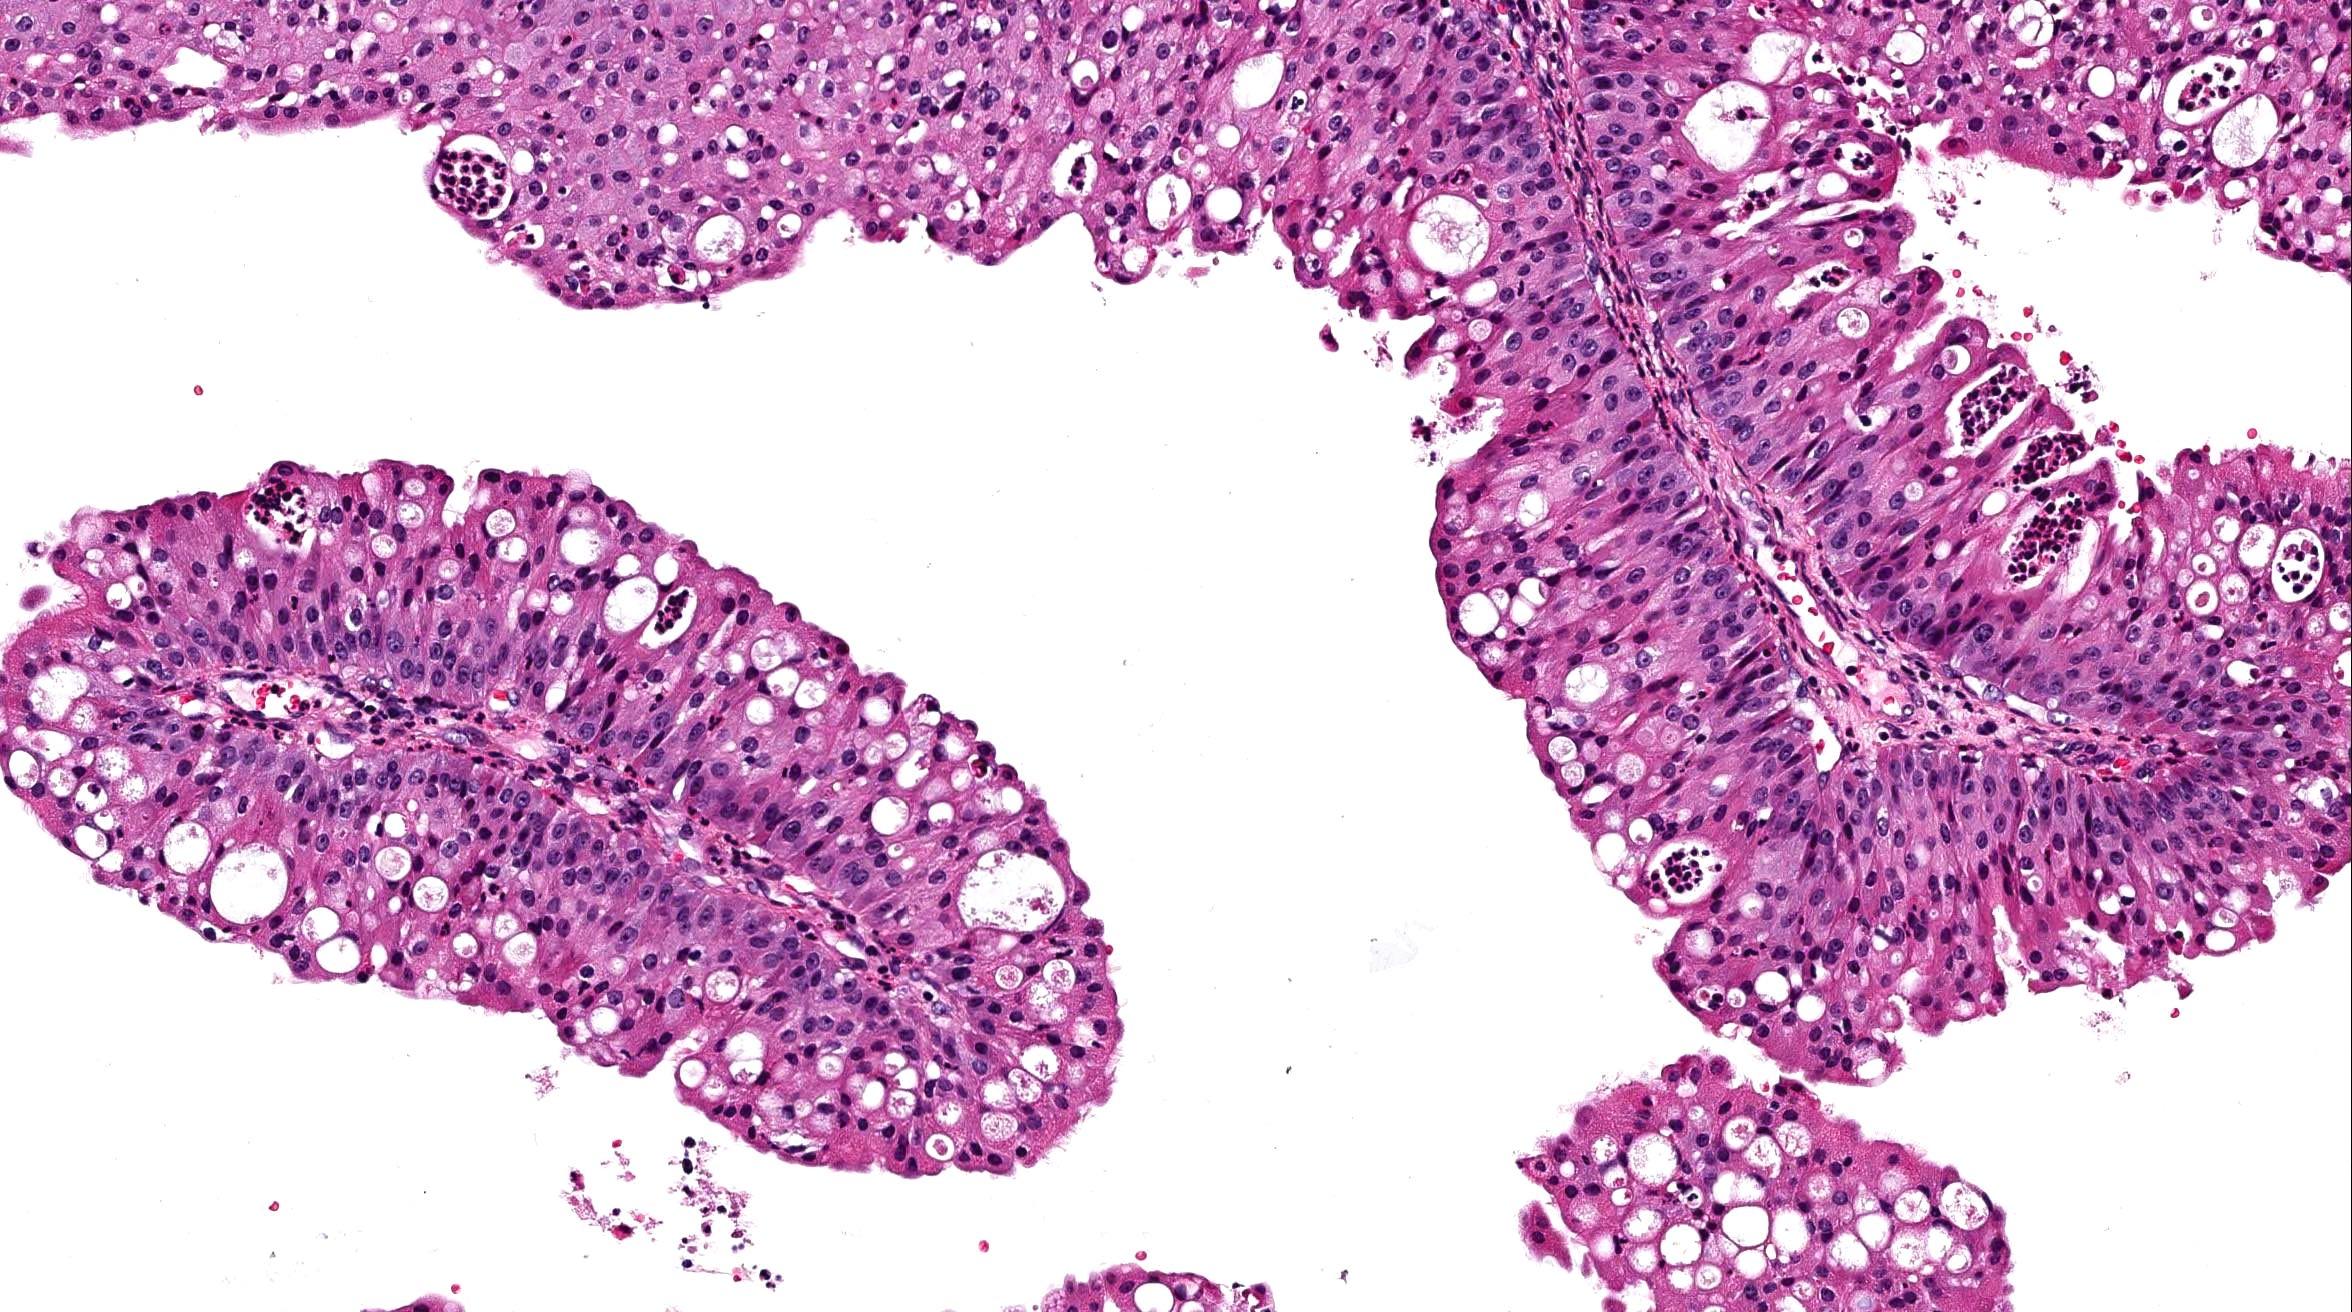 cancer bucal definicion papiloma humano n1